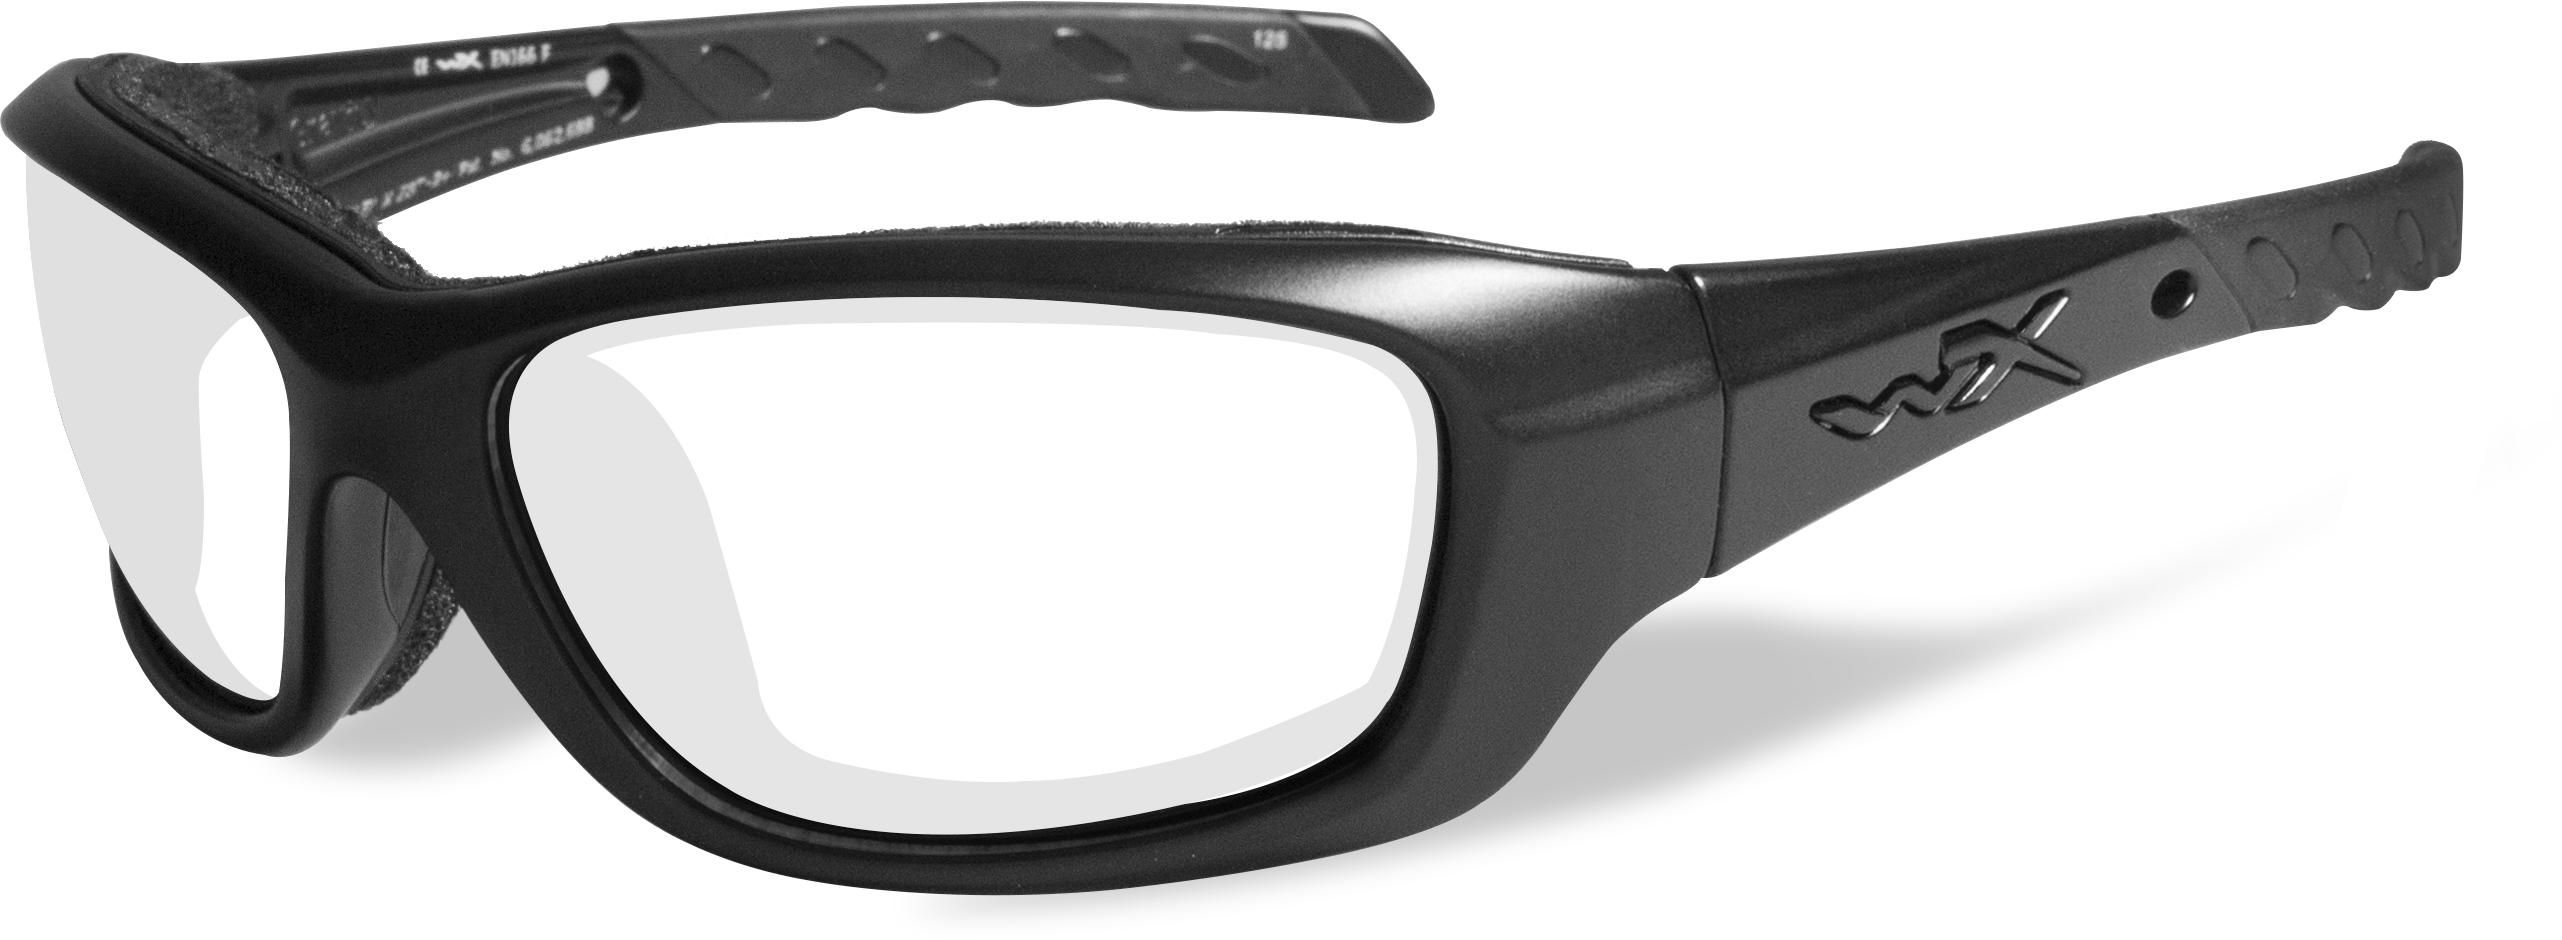 262e9c2de3 Wiley X WX Gravity Climate Control Sunglasses